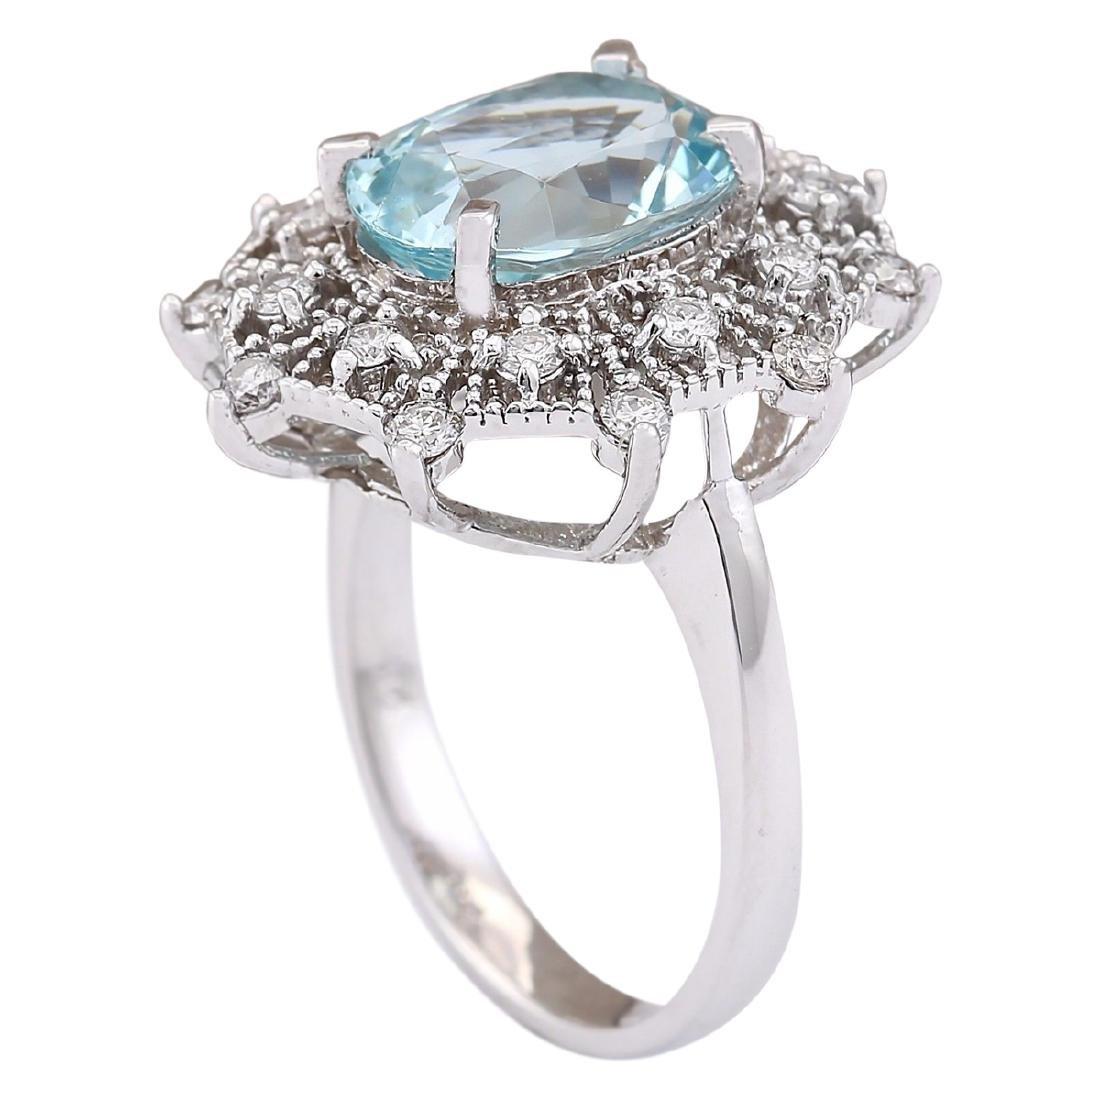 4.32 CTW Natural Aquamarine And Diamond Ring In 18K - 3